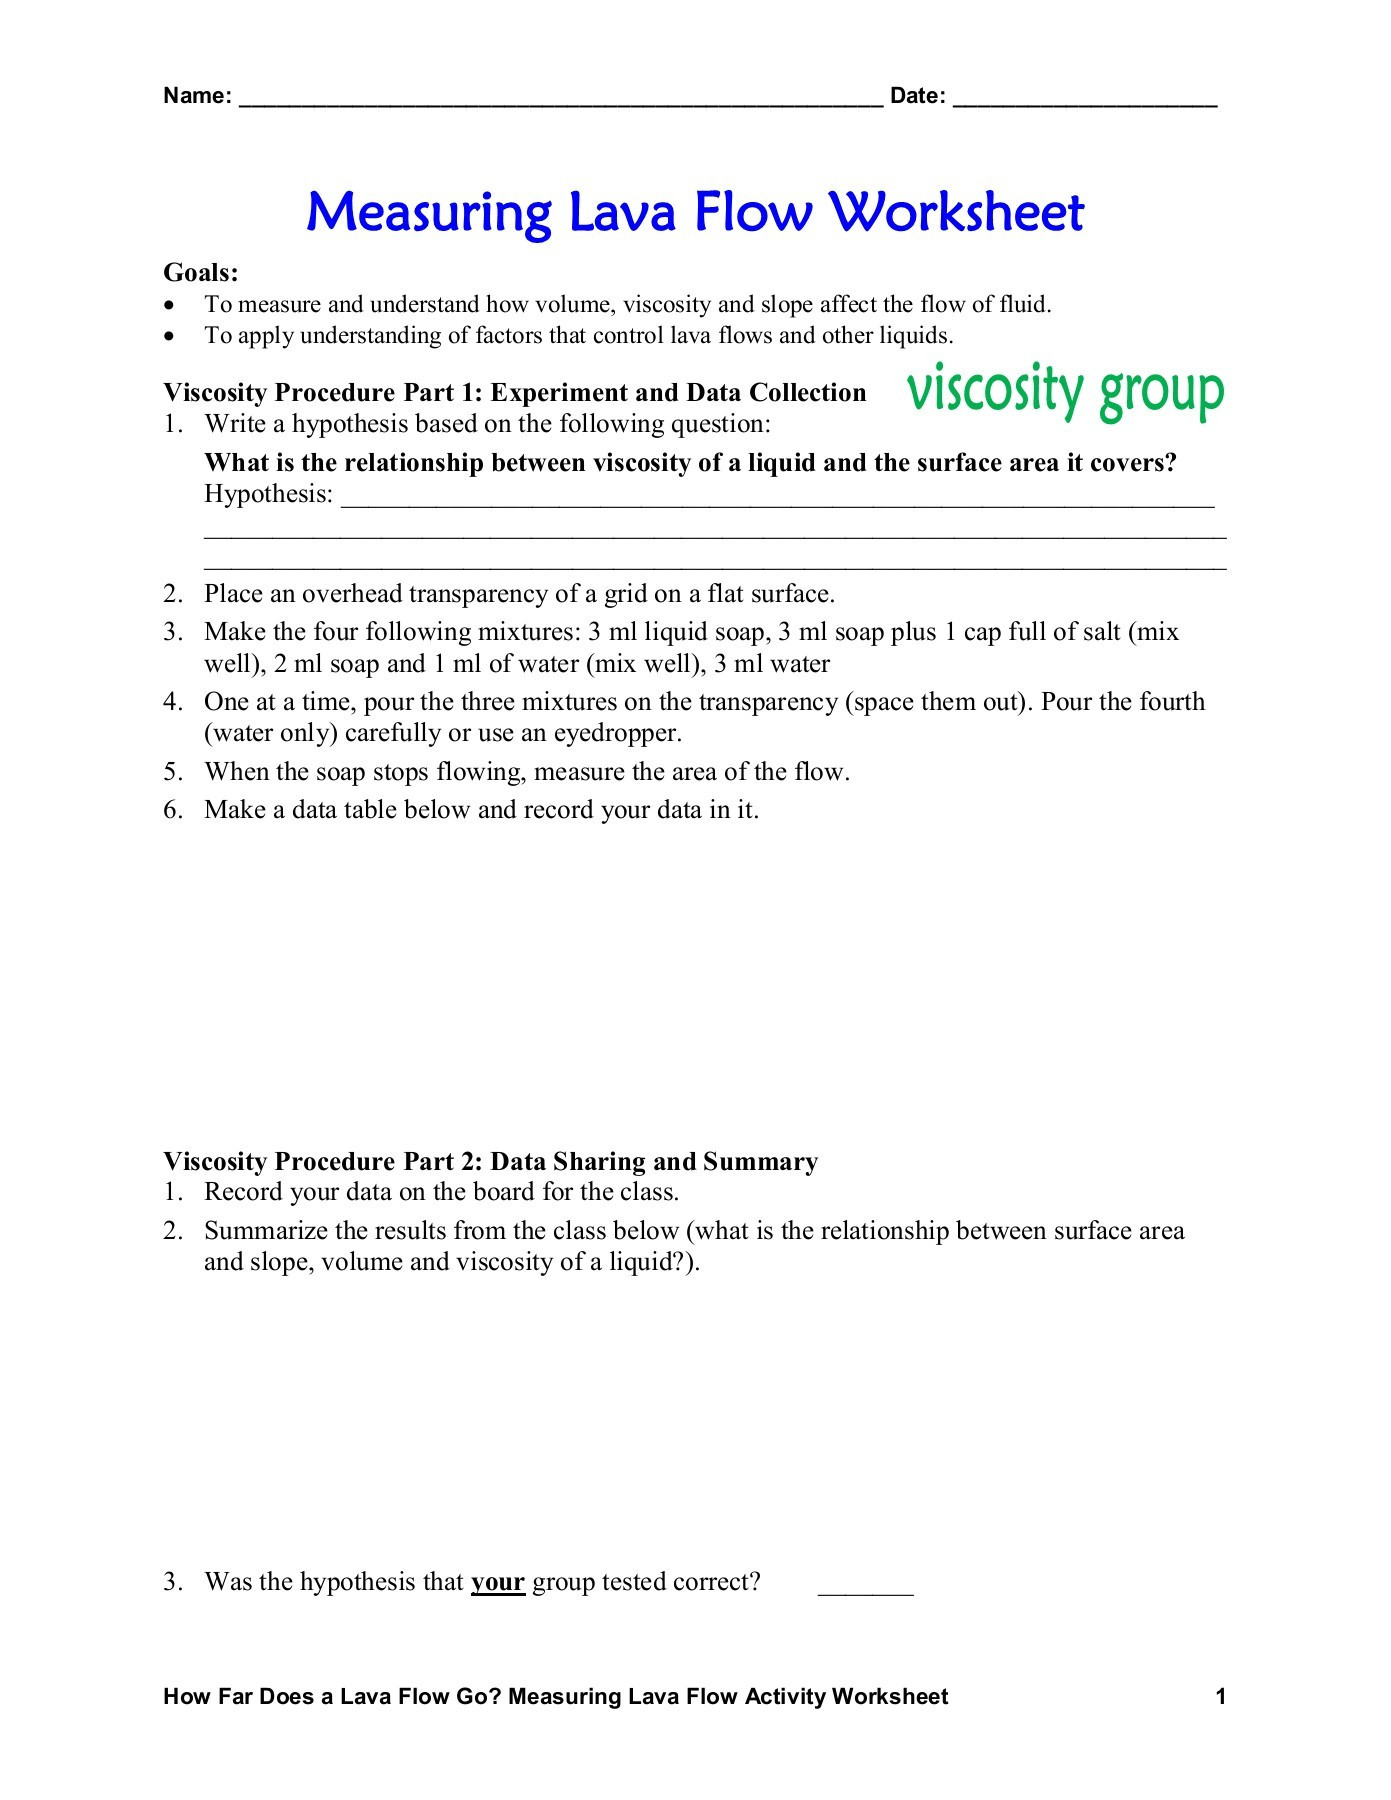 Writing A Hypothesis Worksheet Measuring Lava Flow Worksheet